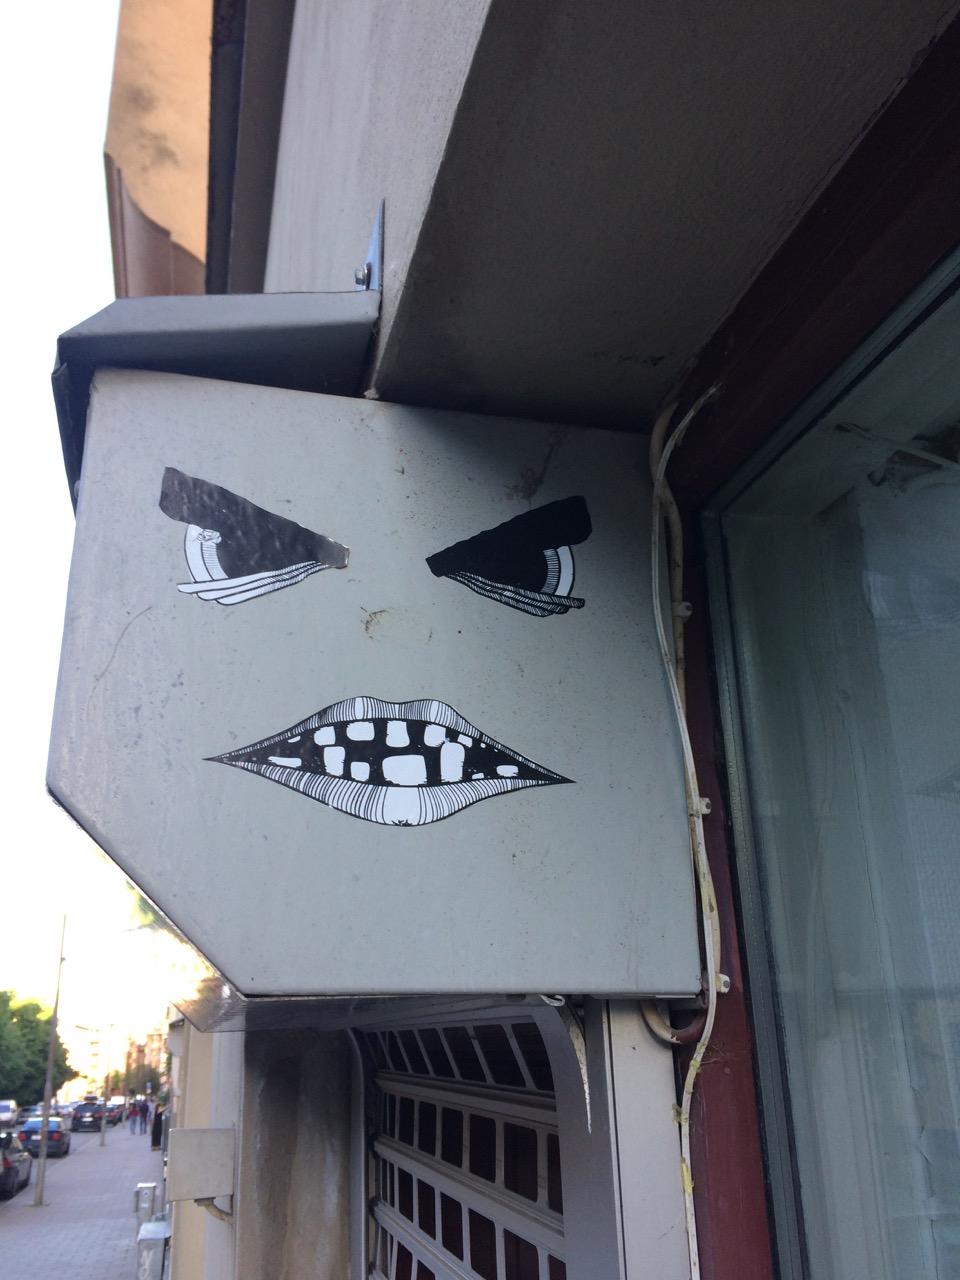 Stockholm street art